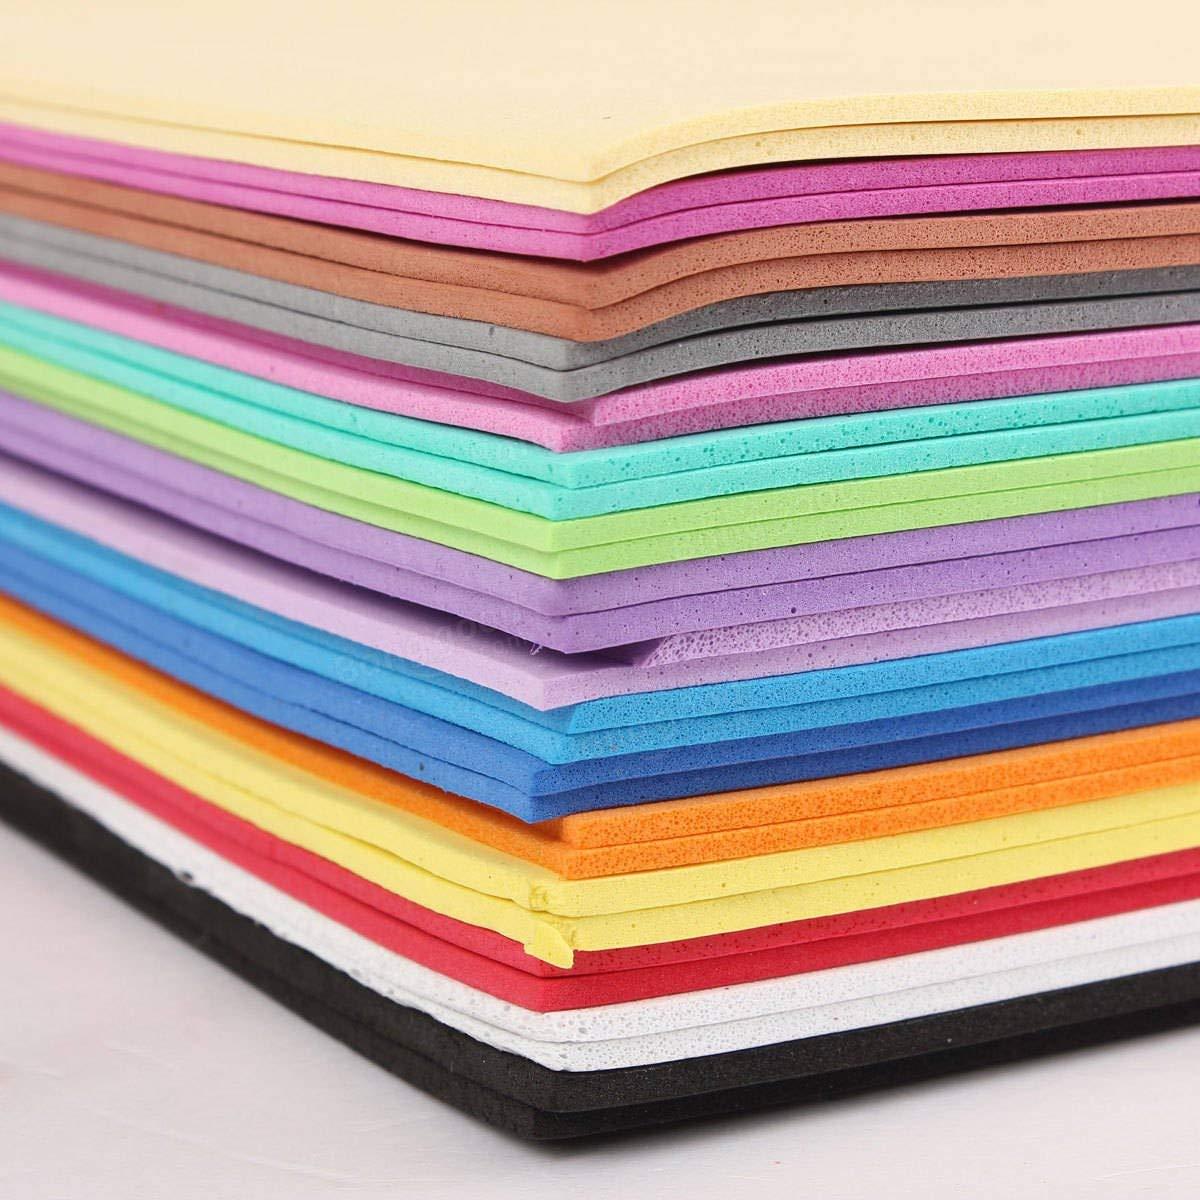 32PCS A4 2mm Foam Sheets Sponge Paper Foam Flower Craft Material Jewelry 16 Color - Tools, Industrial & Scientific Raw Materials - 32PCS\/lot Sponge Foam Paper